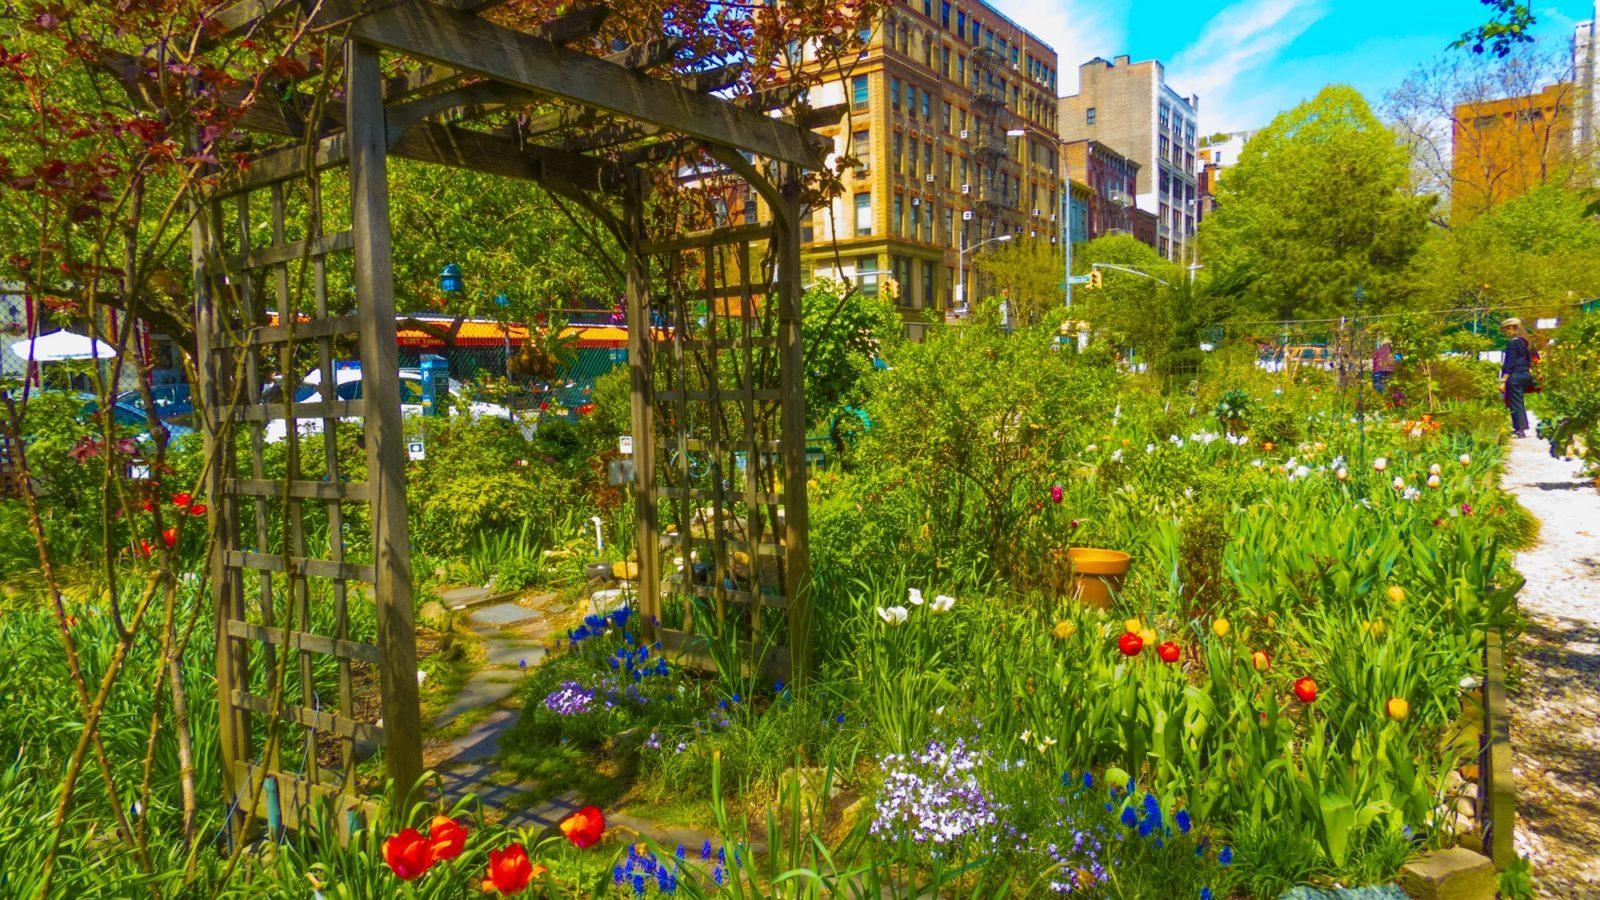 LaGuardia Corner Gardens